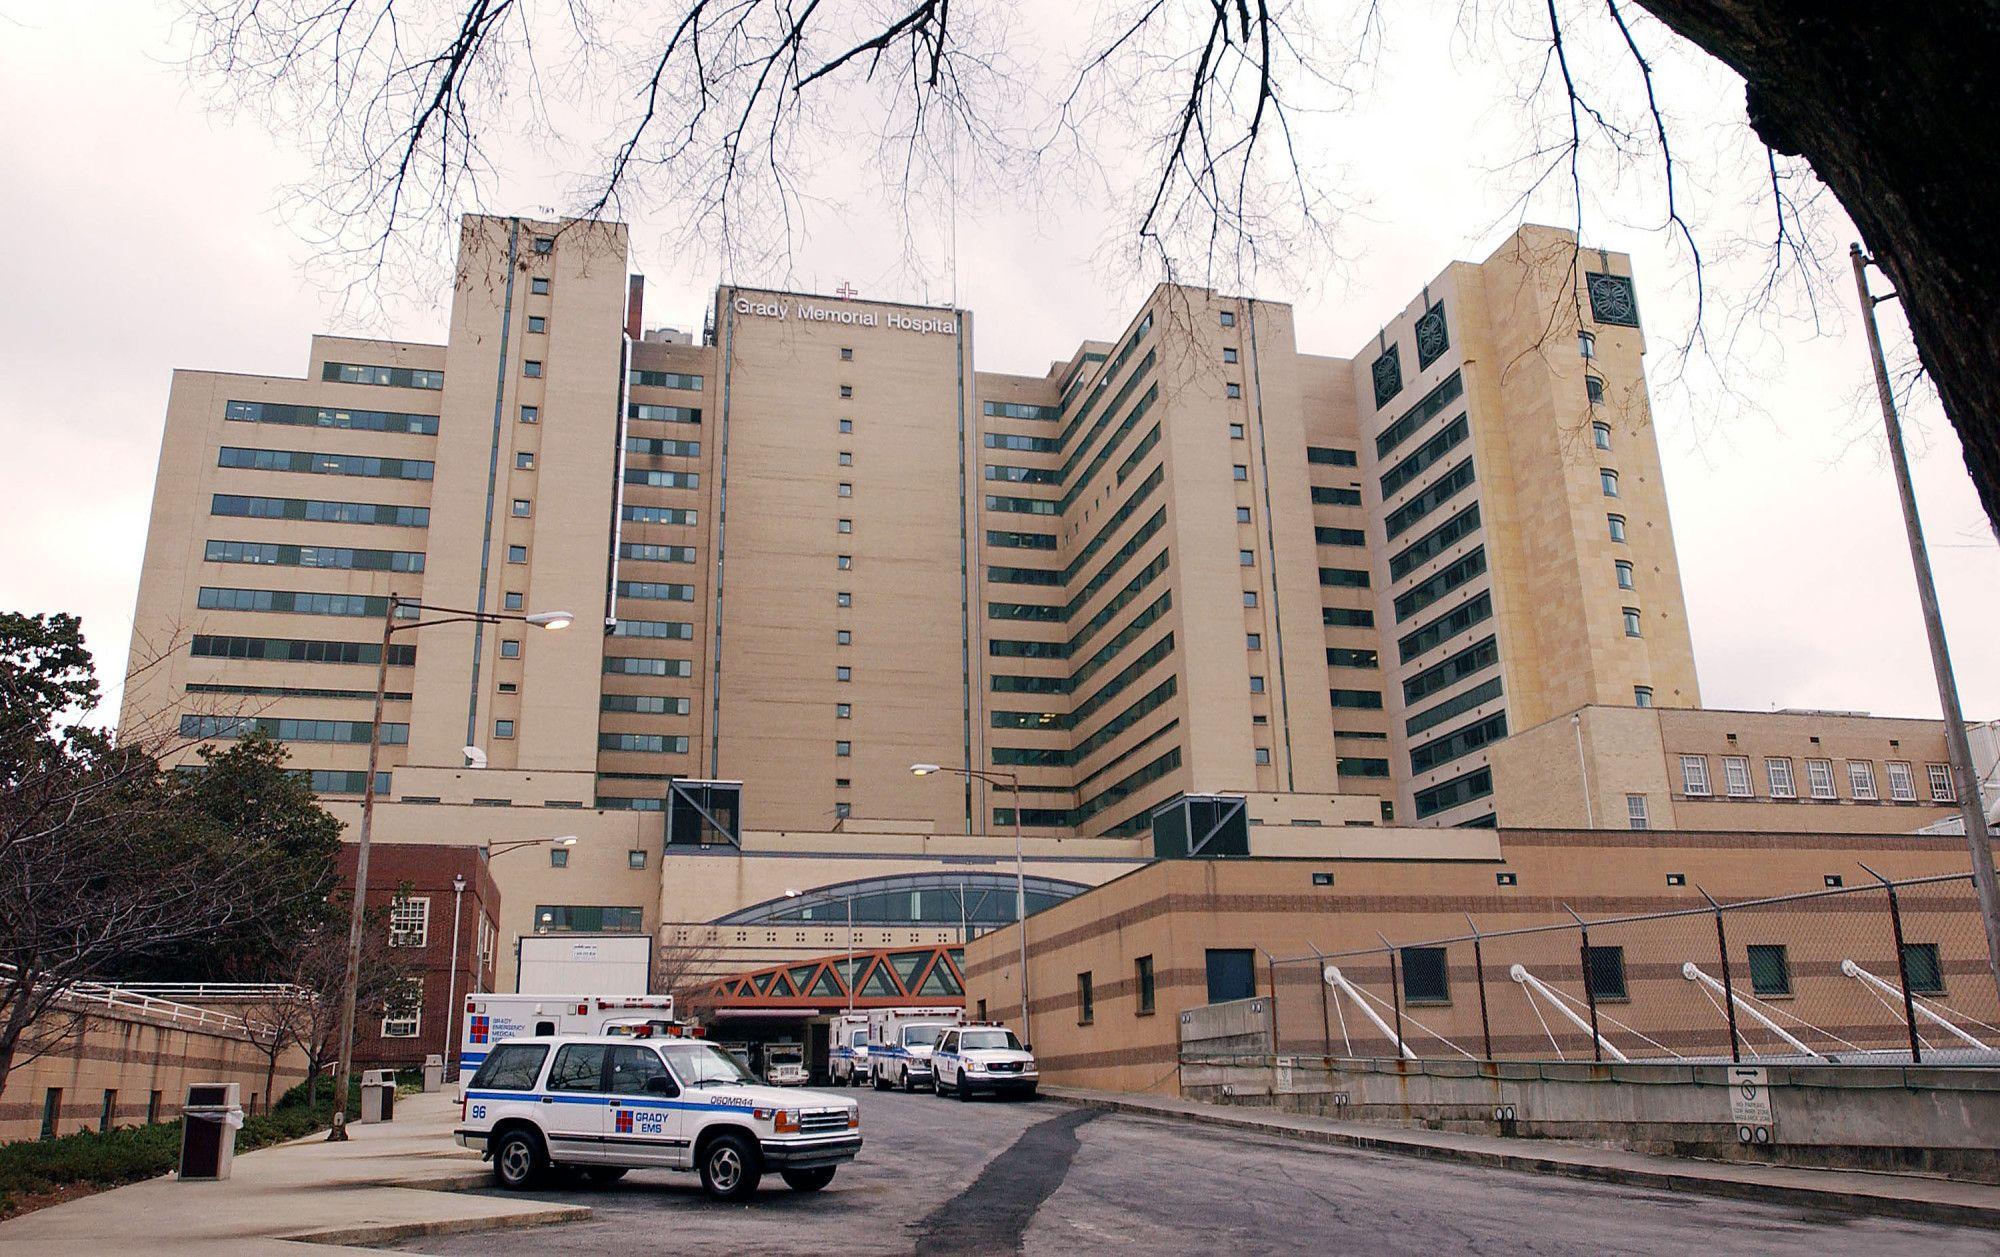 Grady Memorial Hospital in Atlanta, GA Memorial hospital